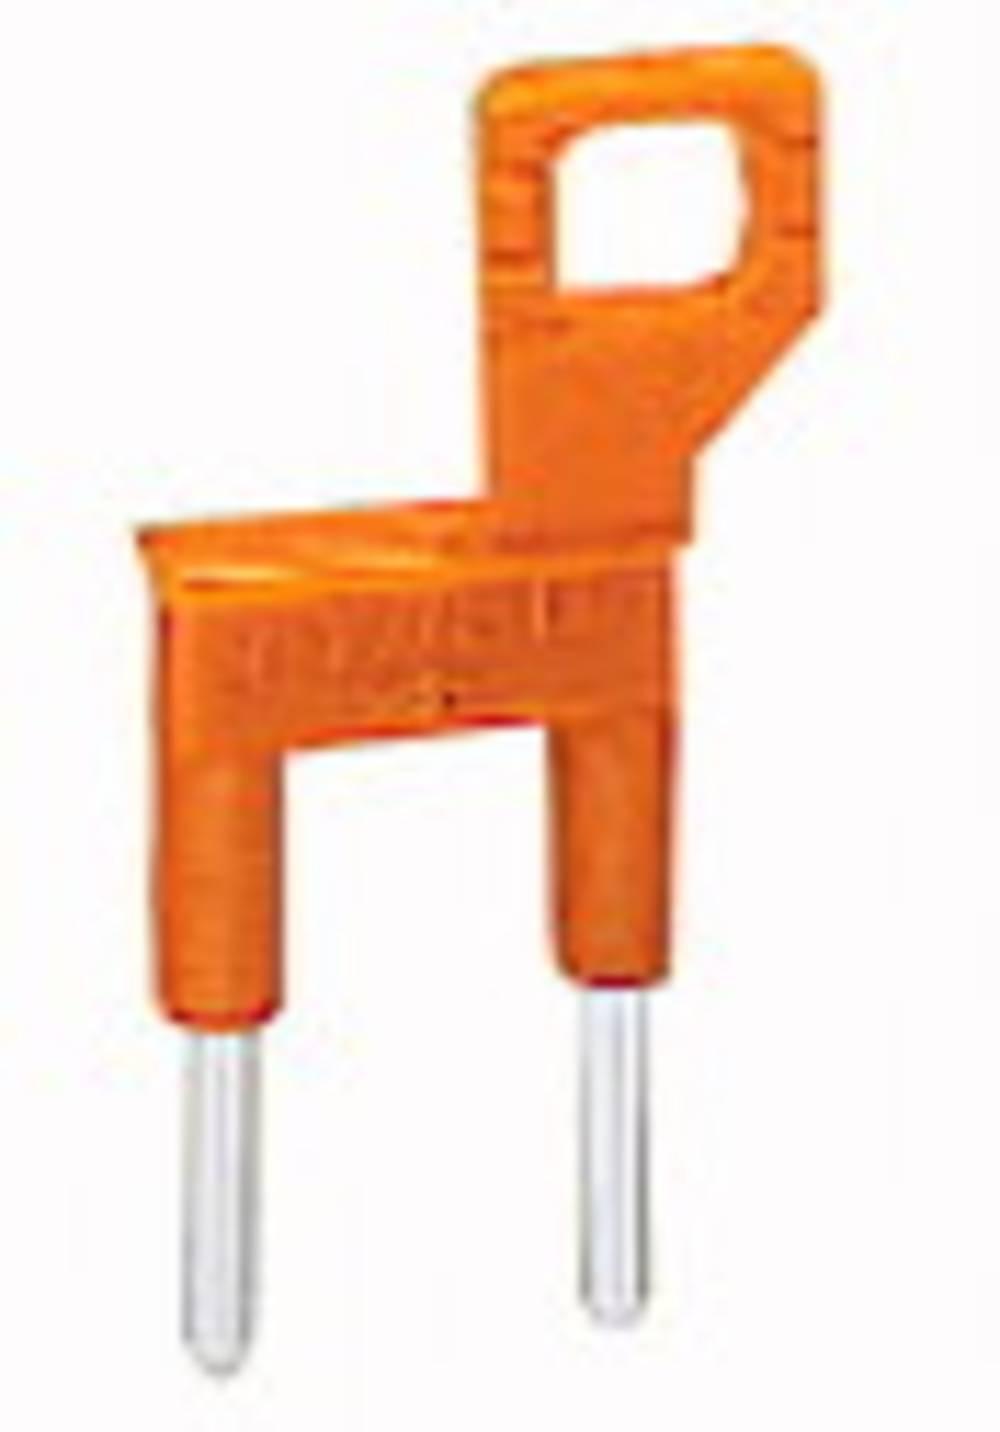 adskille jumper WAGO 100 stk